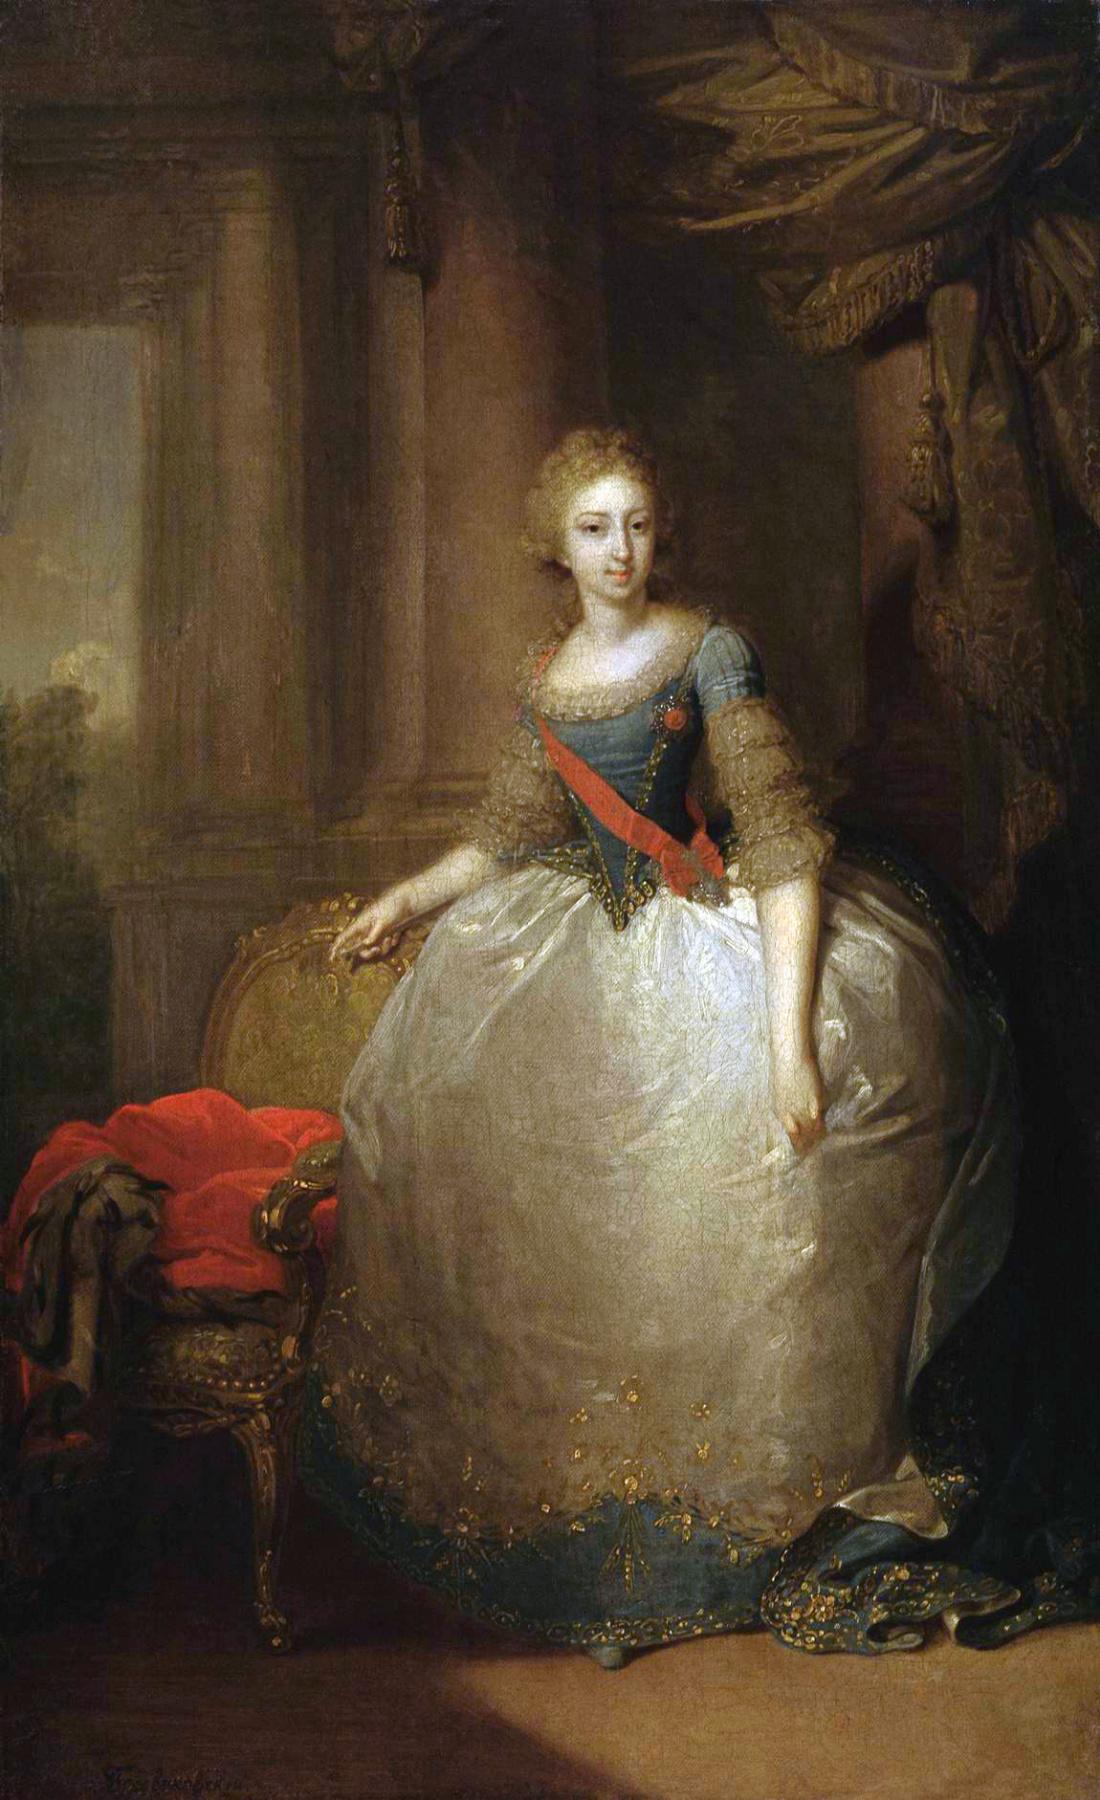 Vladimir Borovikovsky. Portrait of Grand Duchess Elena Pavlovna, daughter of Paul I